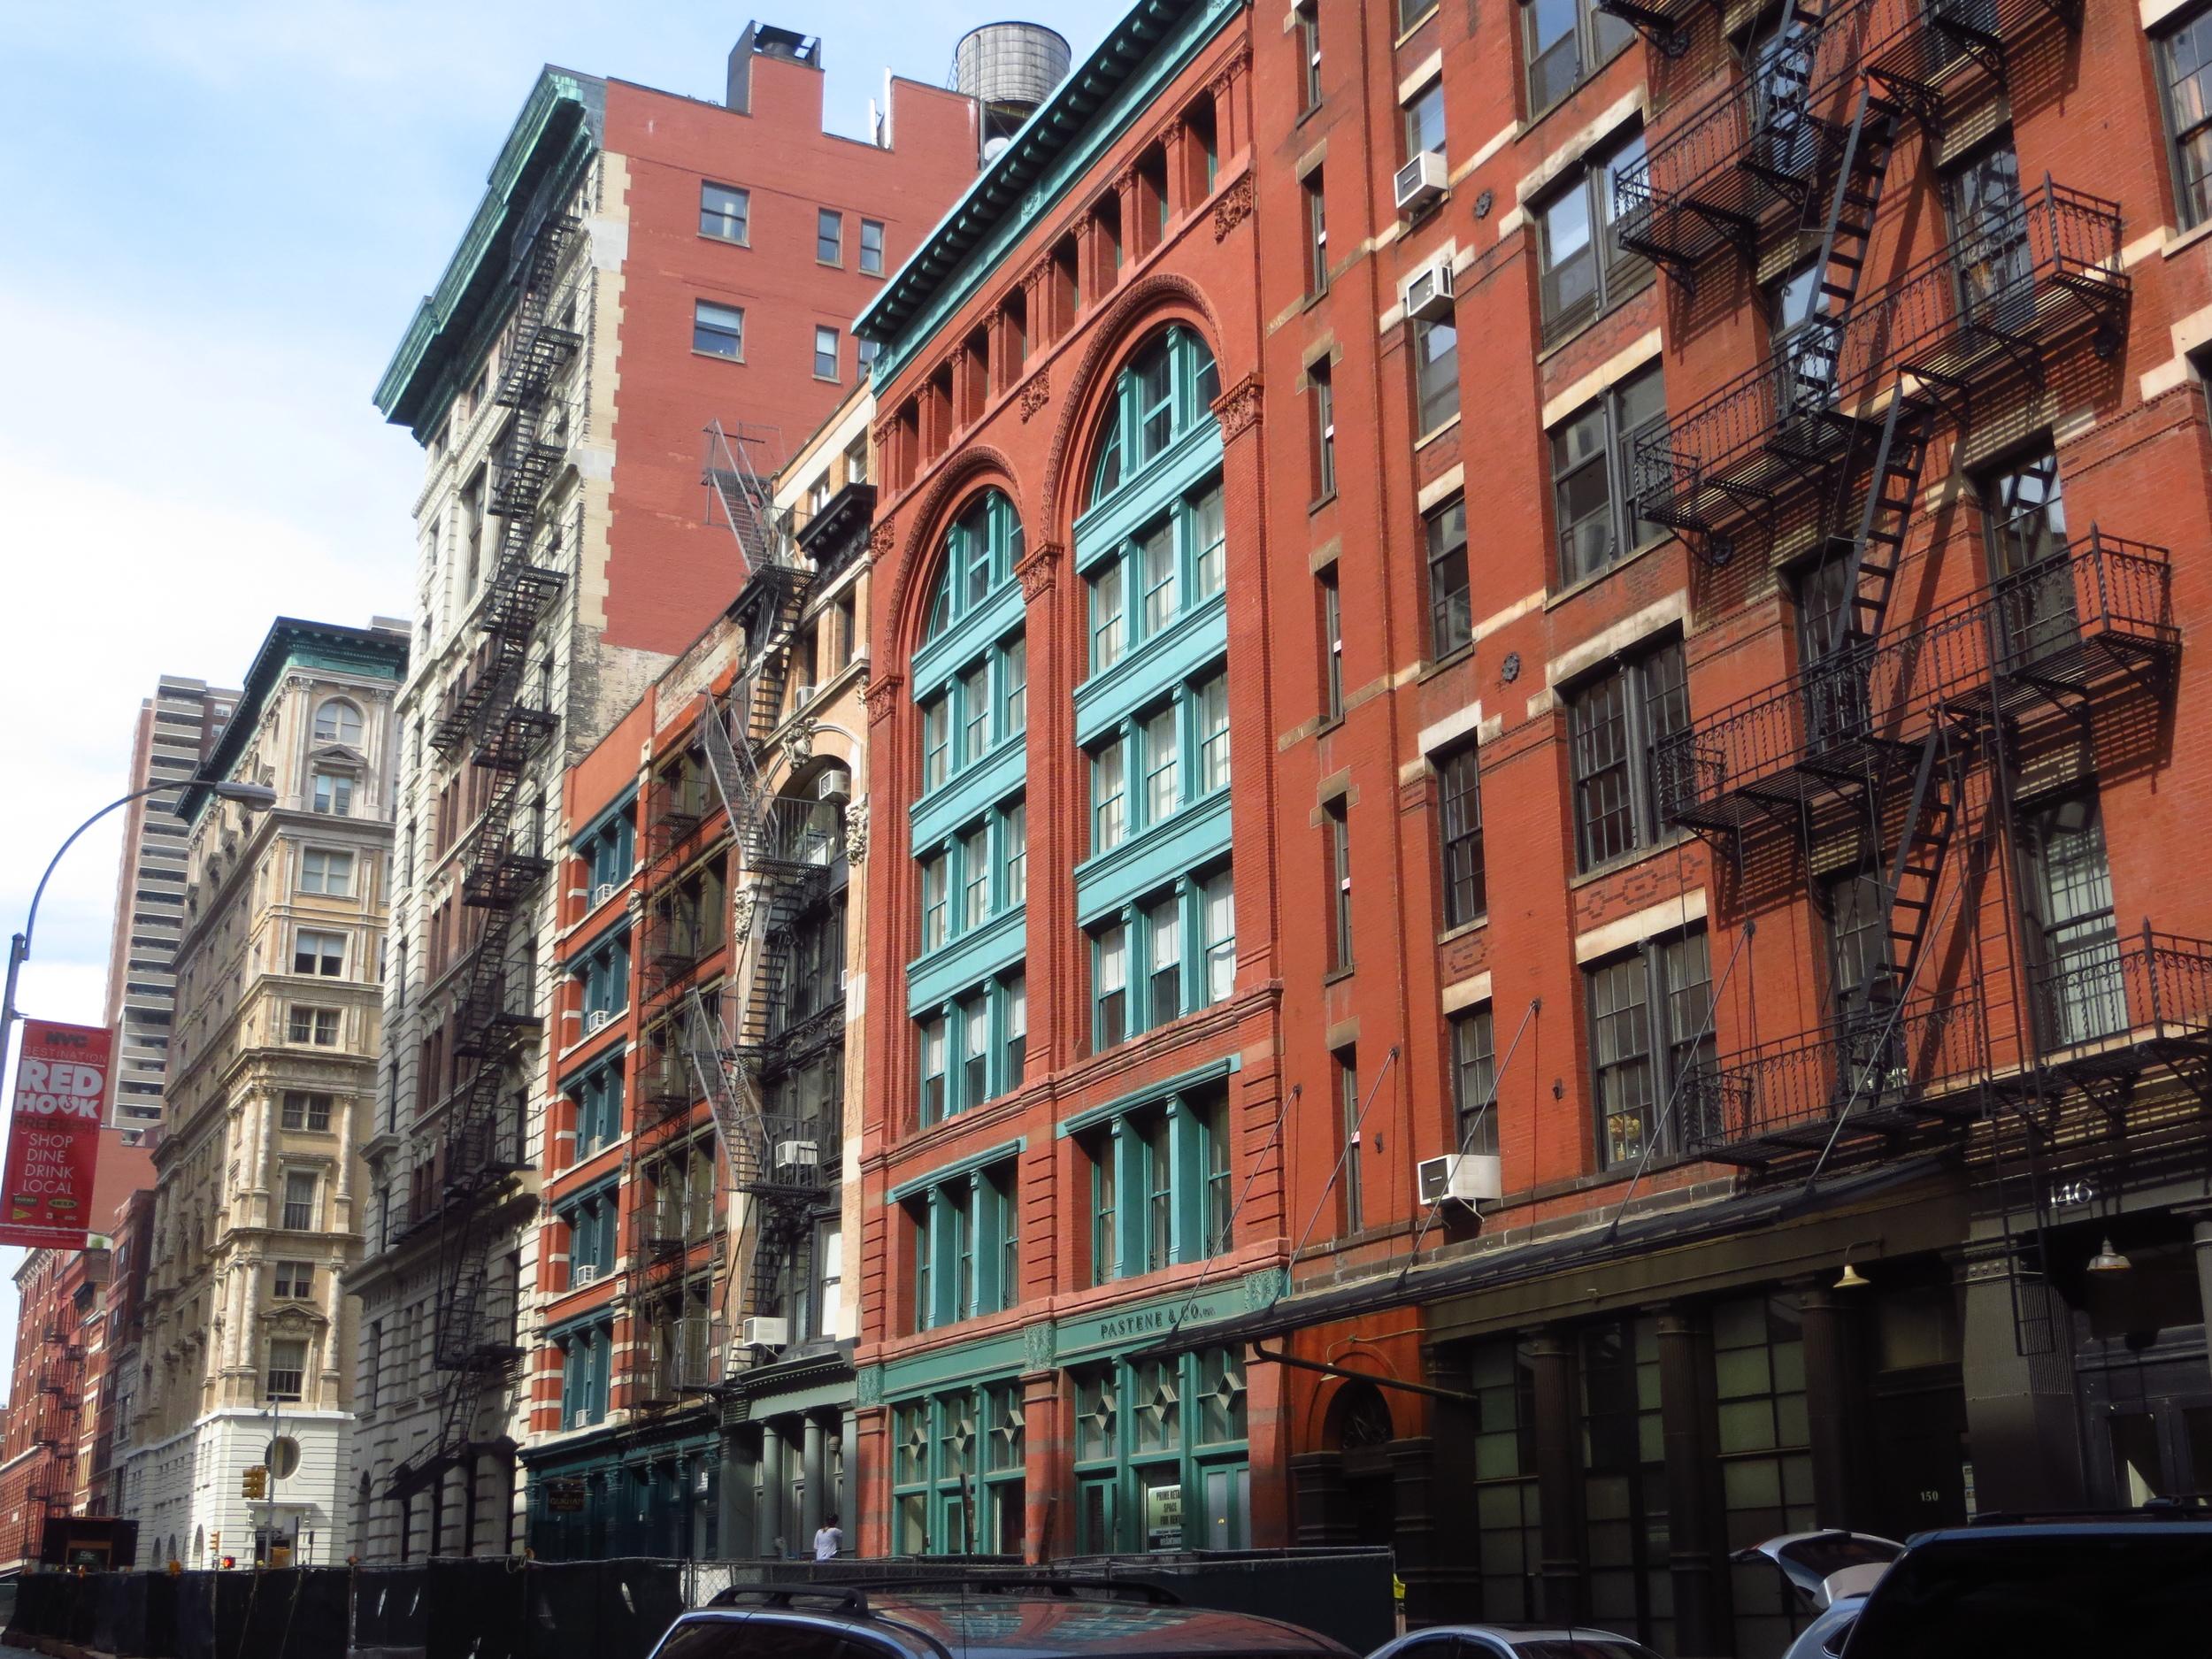 Franklin St. buildings